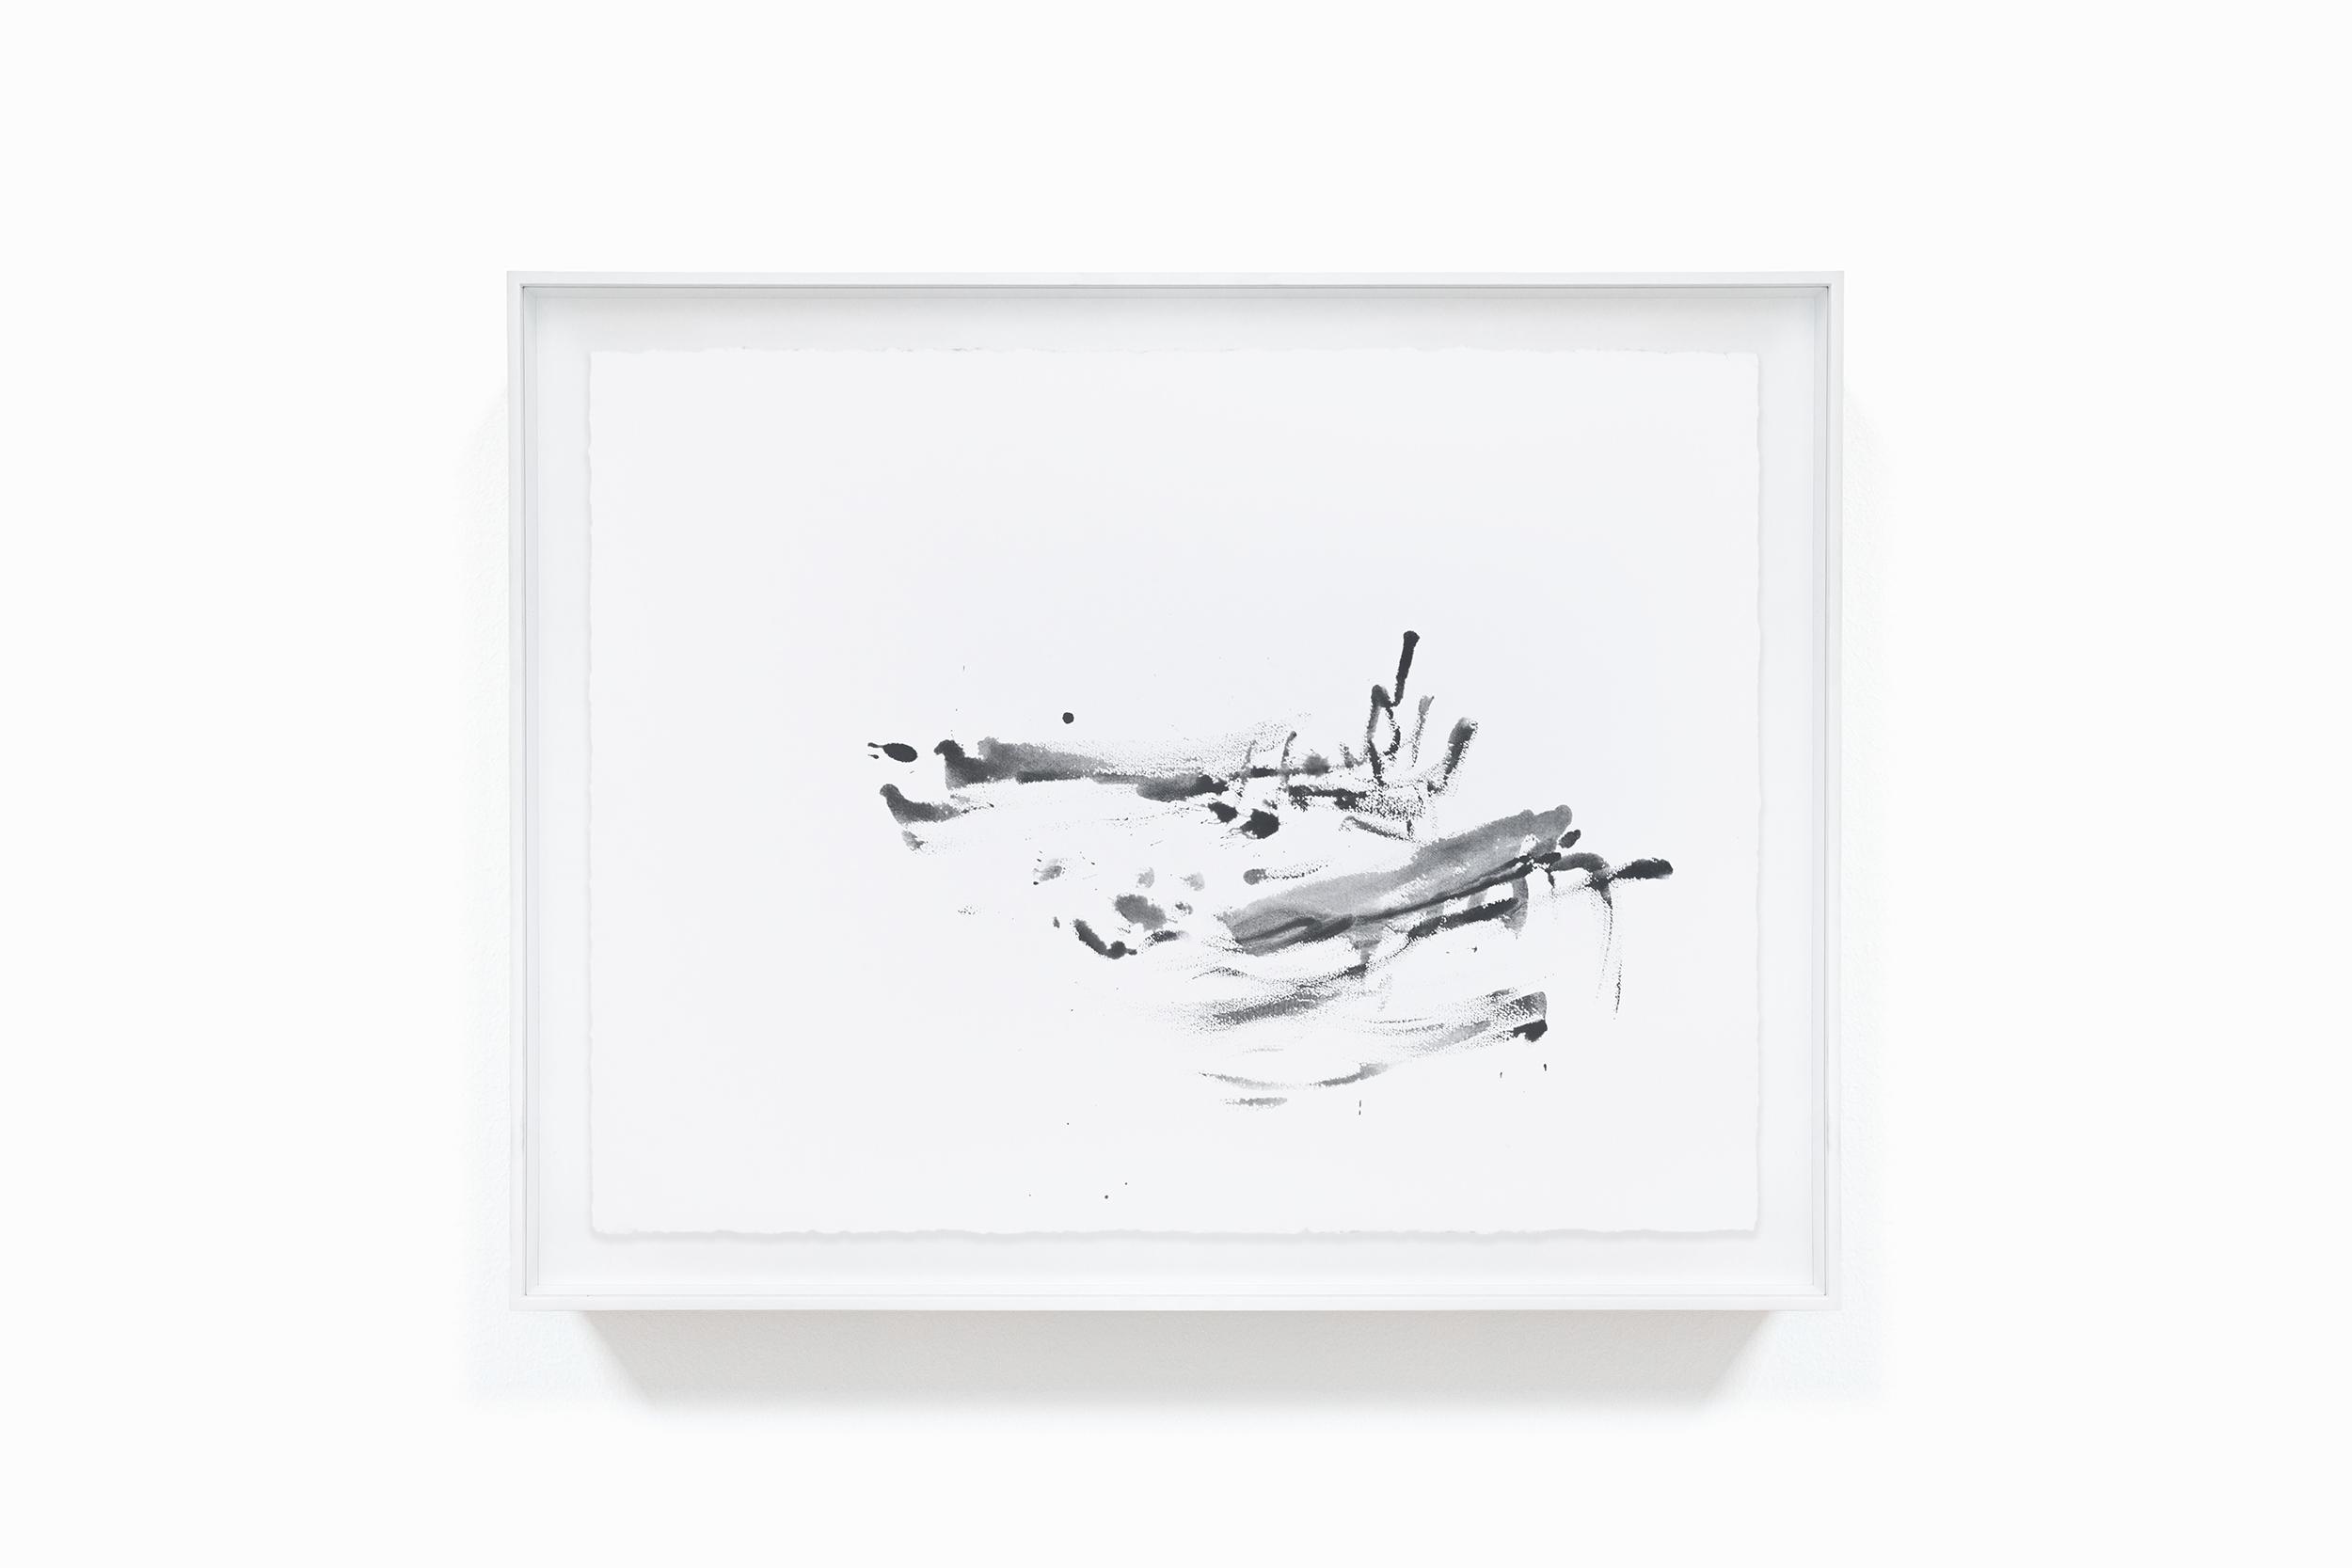 110B Andre Gigante Pintura Painting bonjourmolotov La.jpg